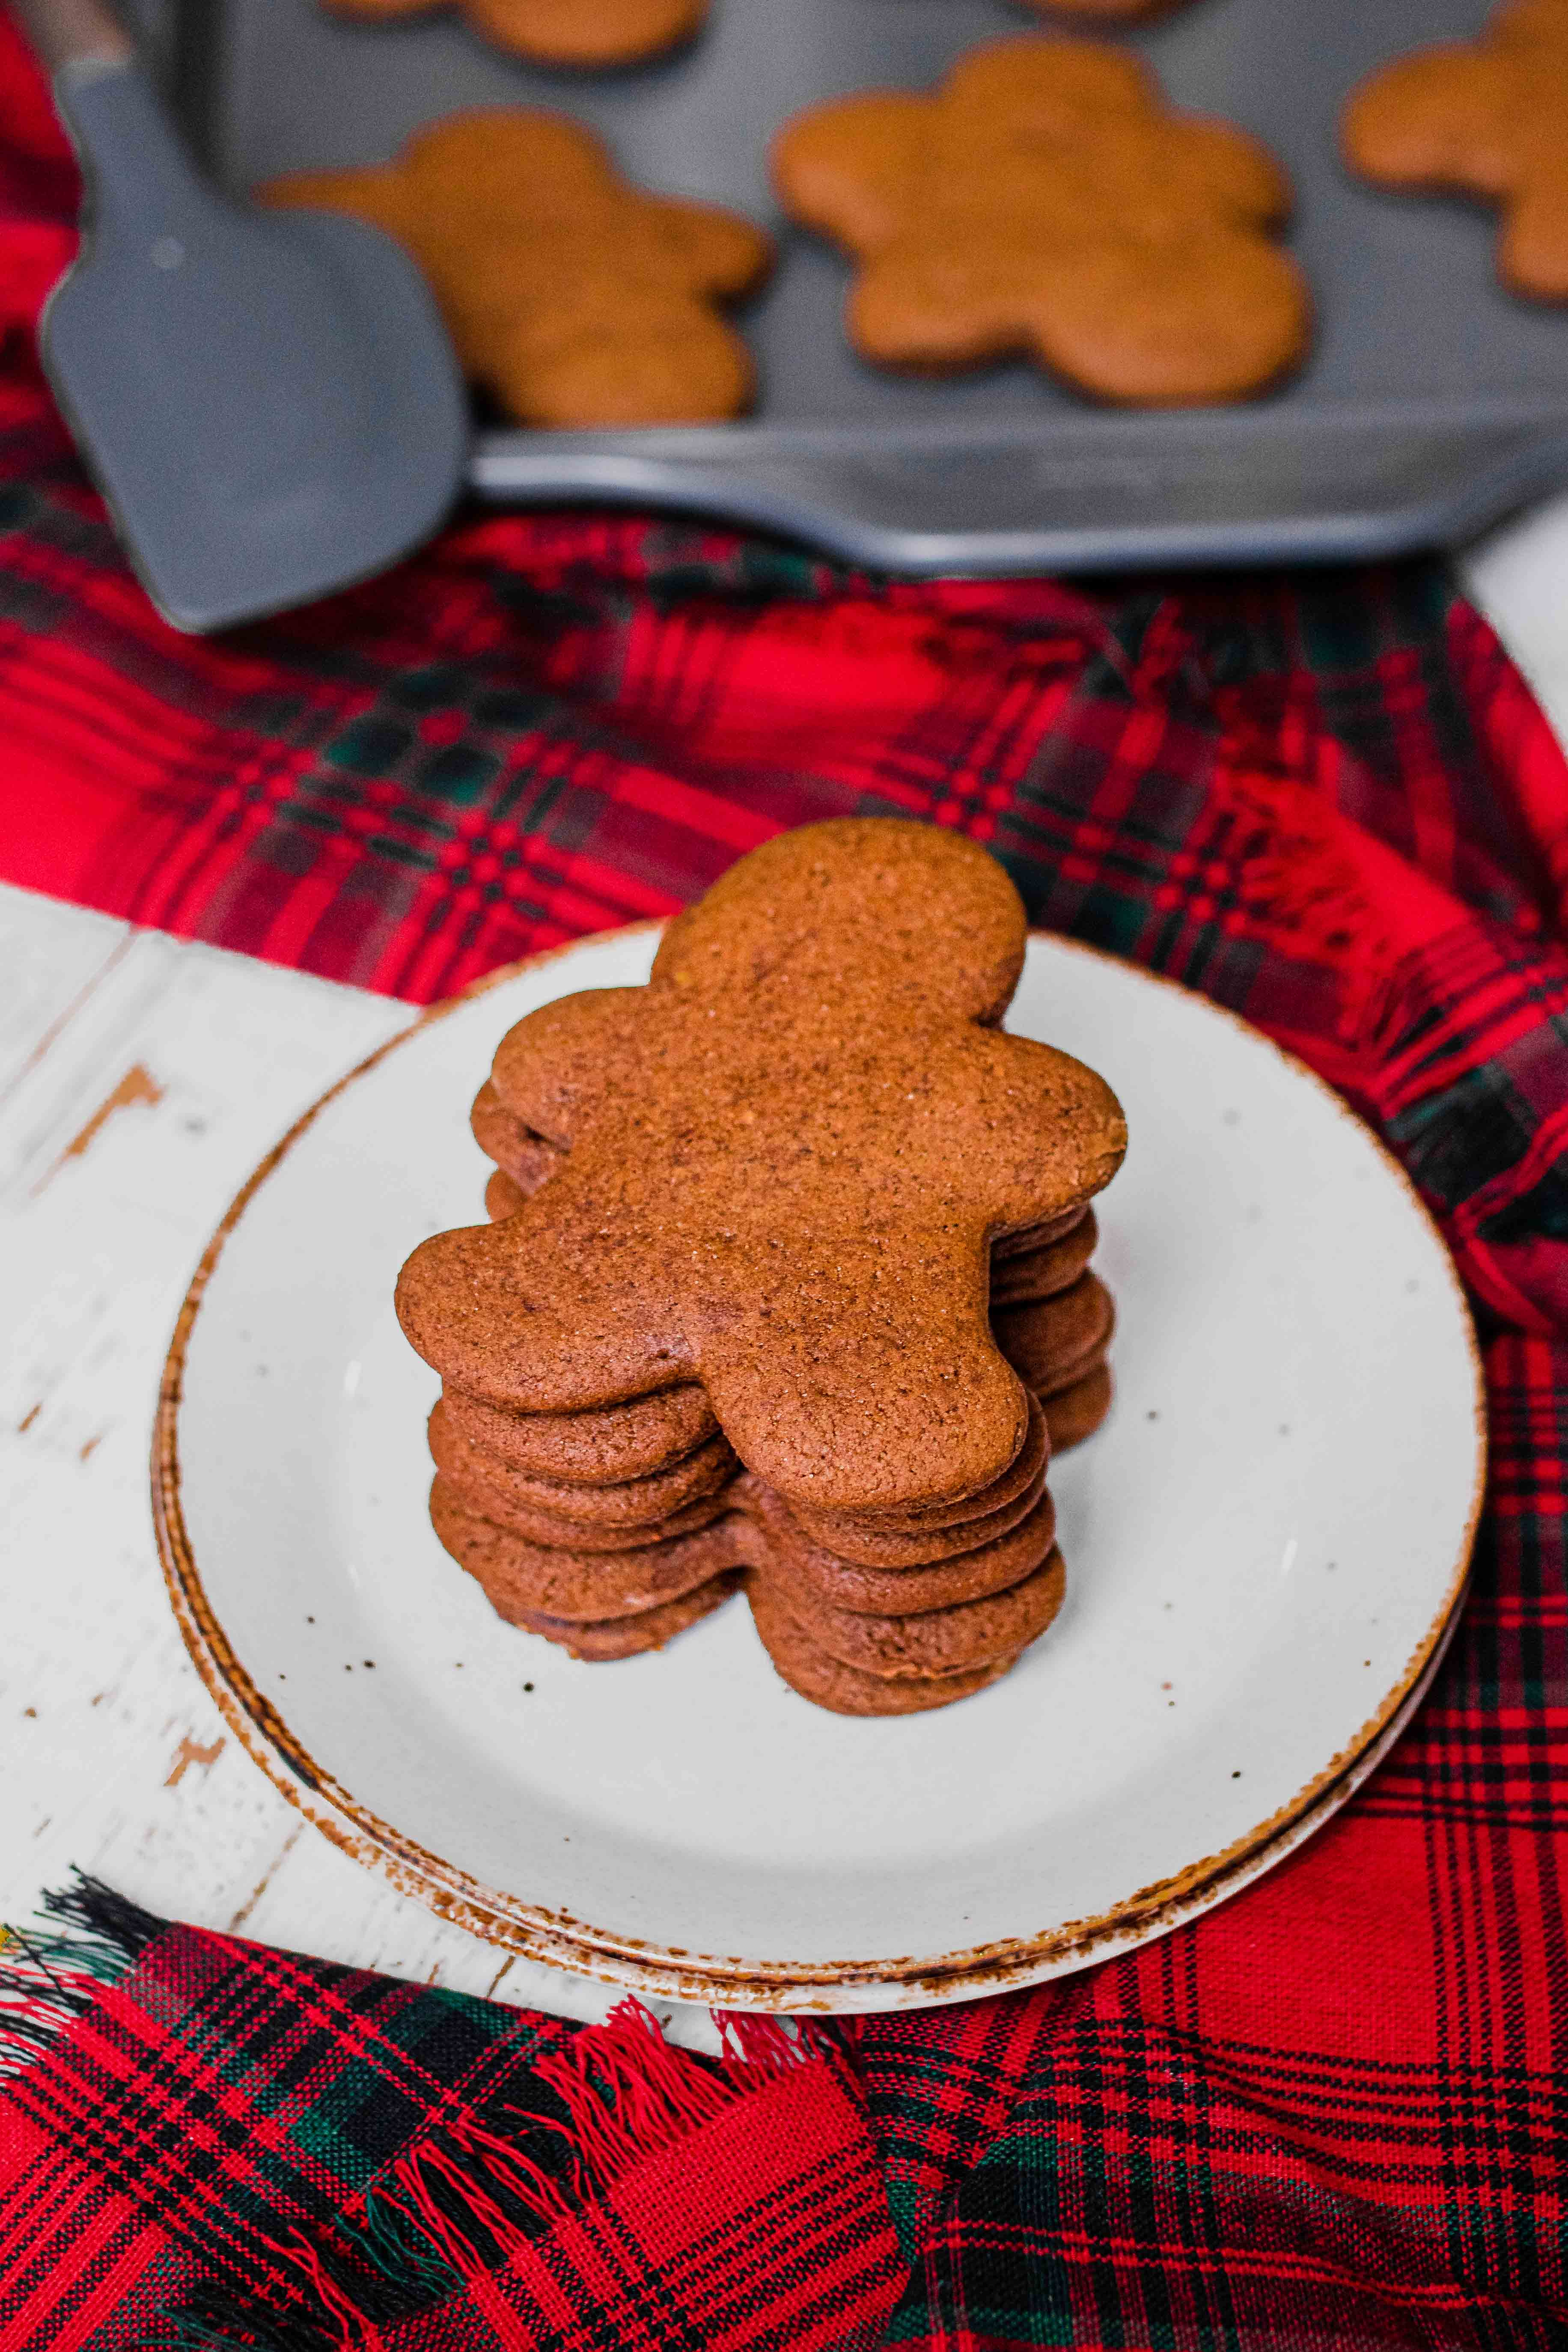 gingerbread people cookies stacked